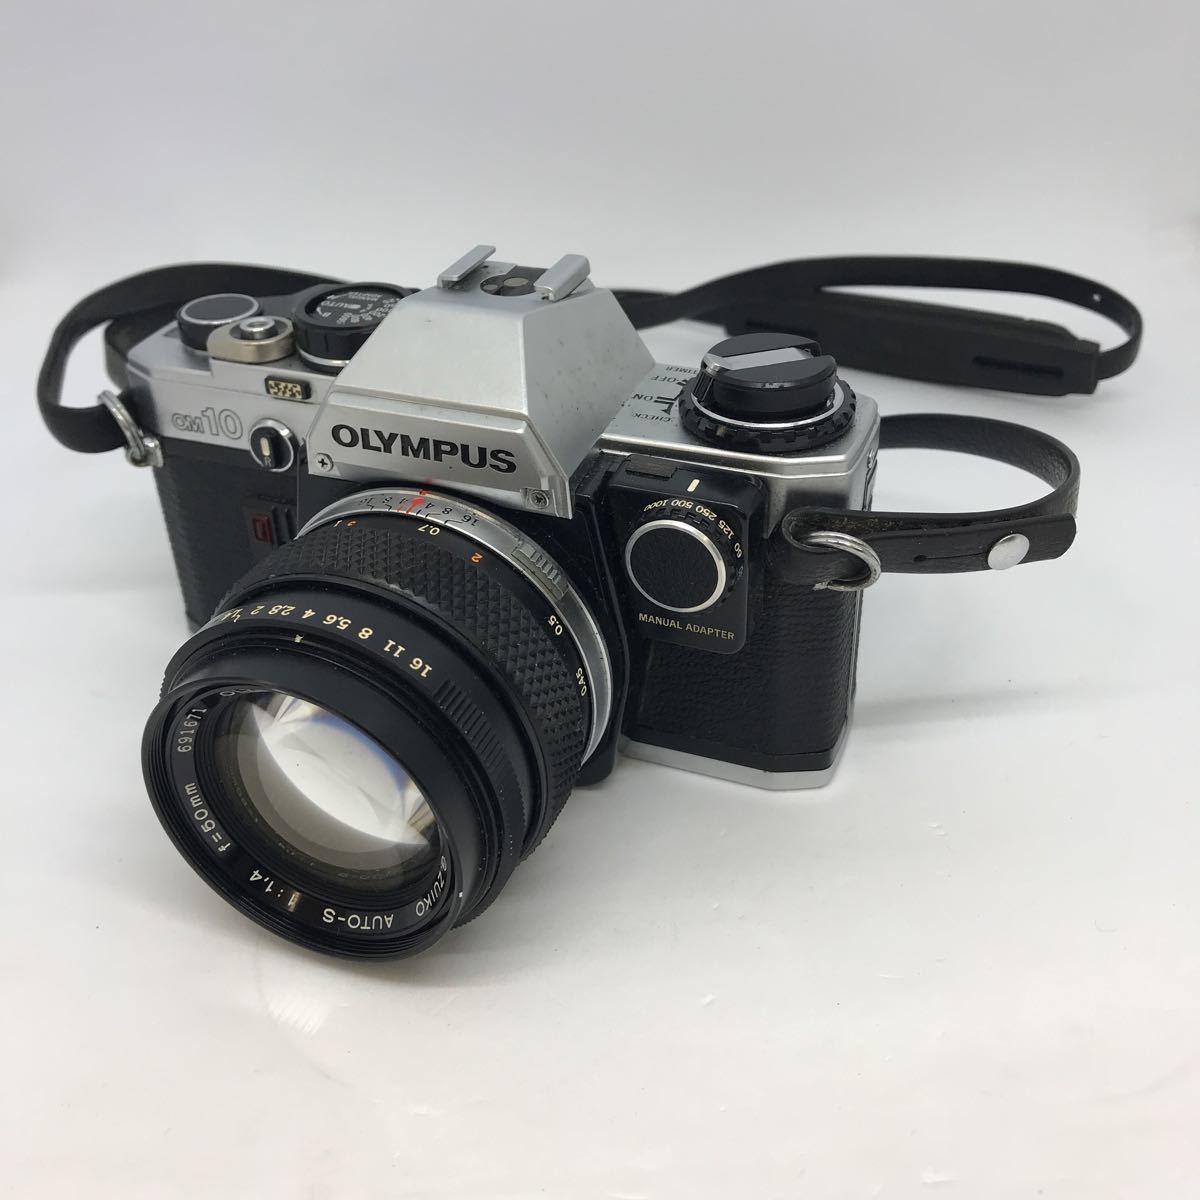 OLYMPUS オリンパス OM10 G.ZUIKO 1:1.4 50mm 一眼レフカメラ